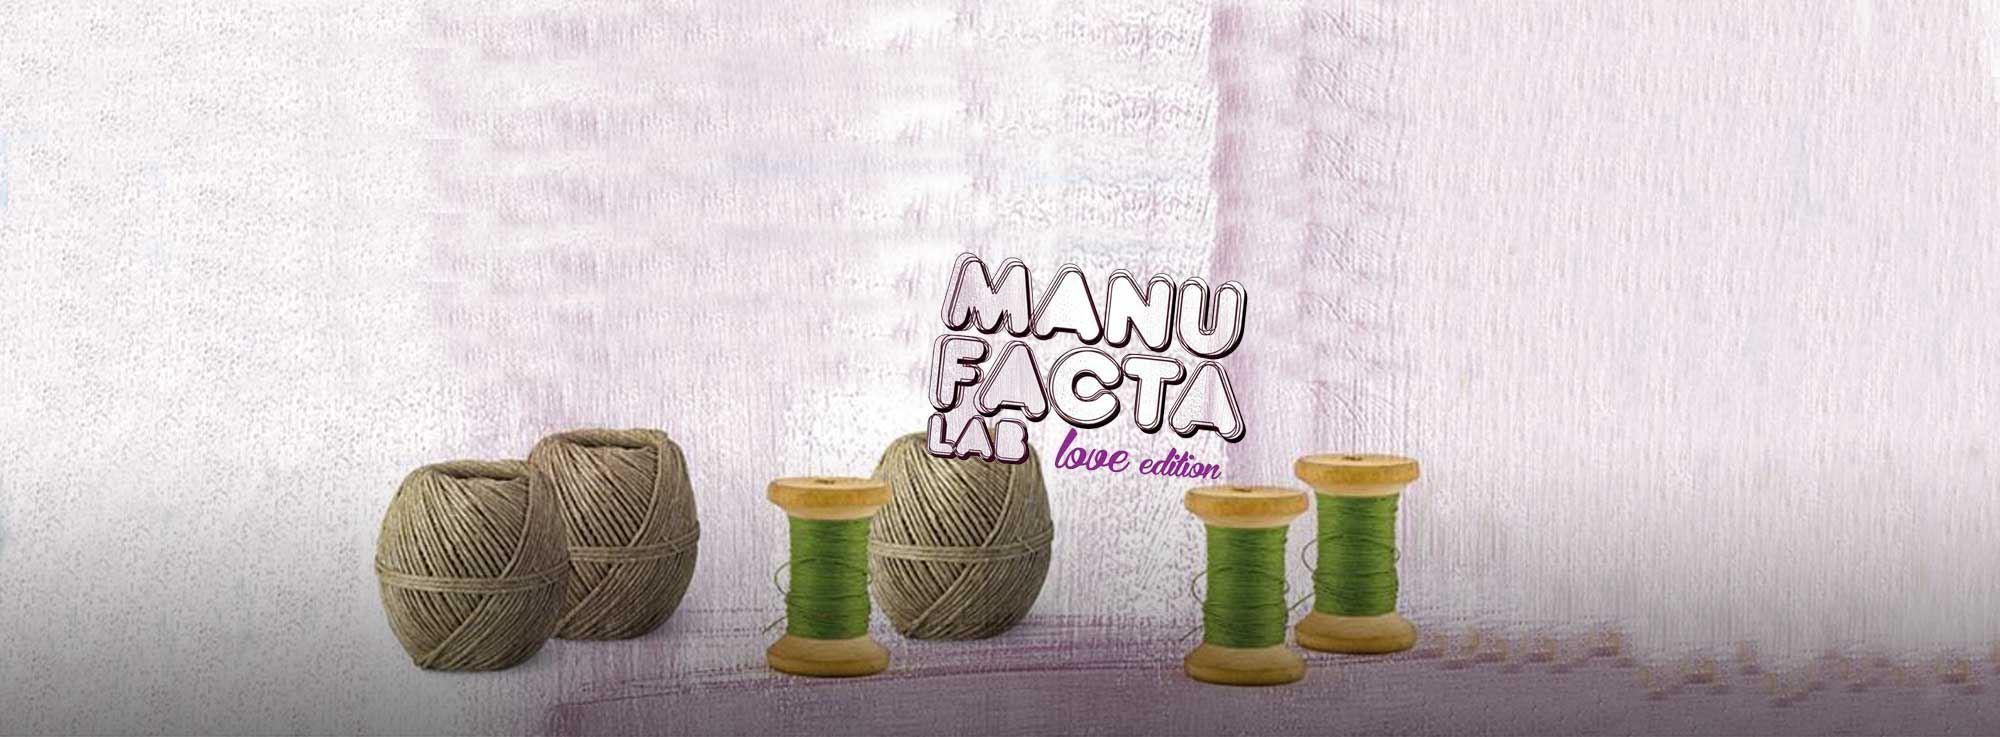 Martina Franca: Manufacta Lab Love Edition